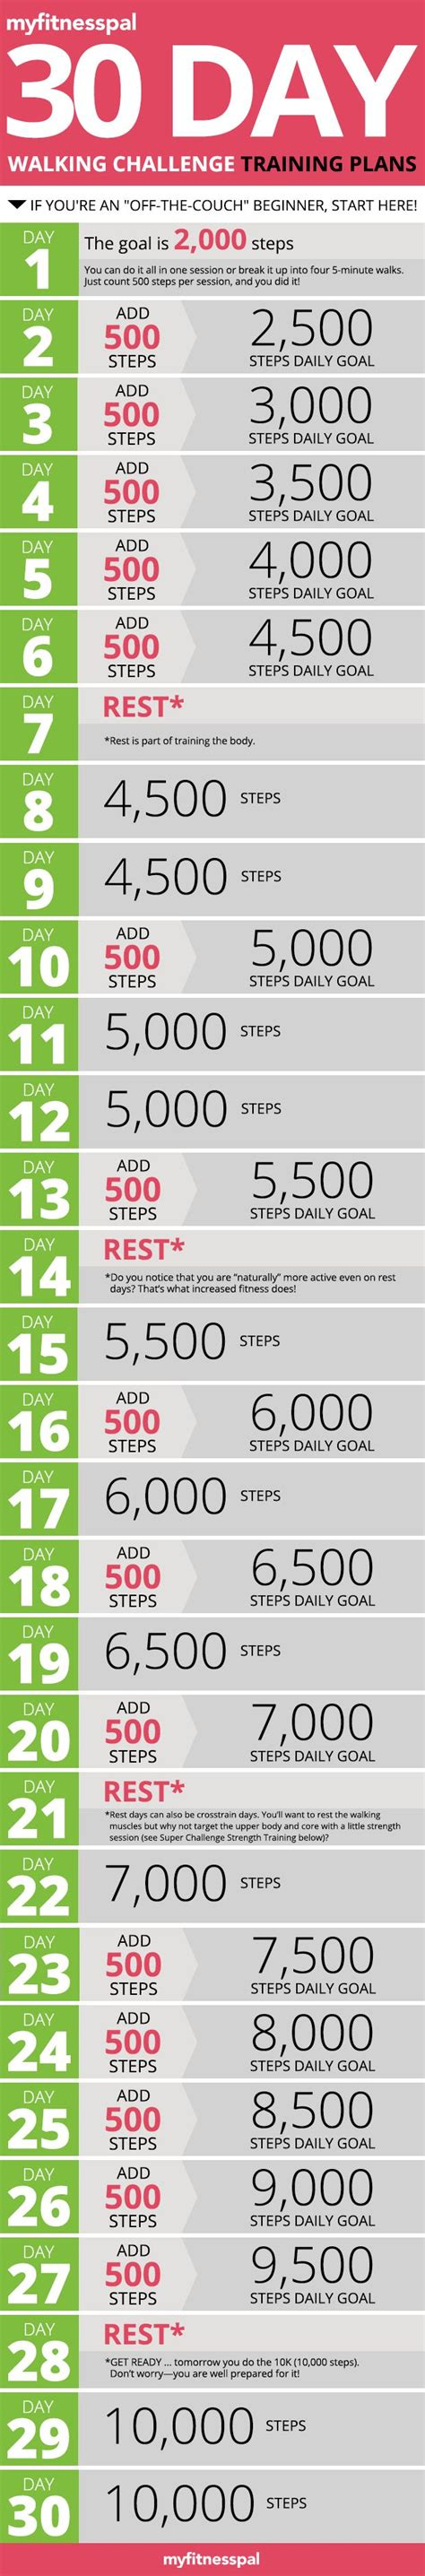 walking challenge ideas 25 best ideas about walking challenge on